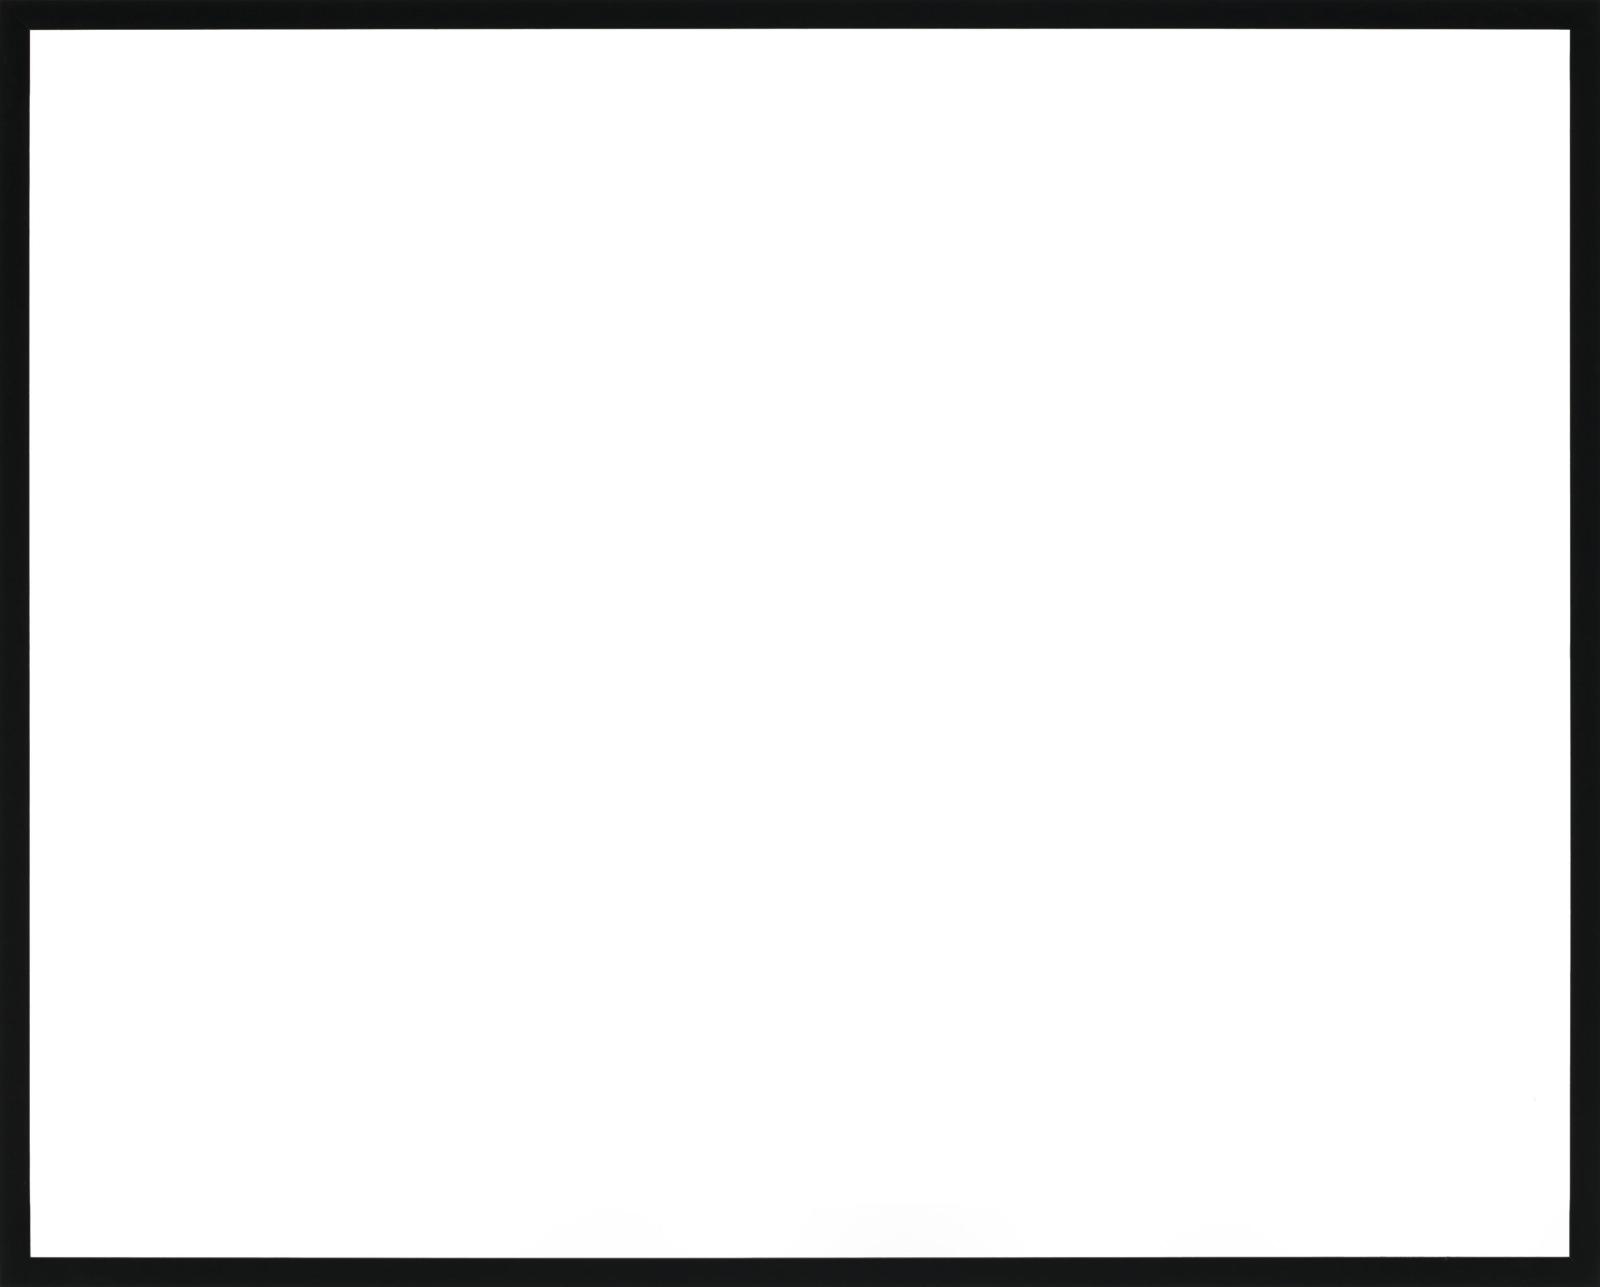 Paper Frame Horizontal Black